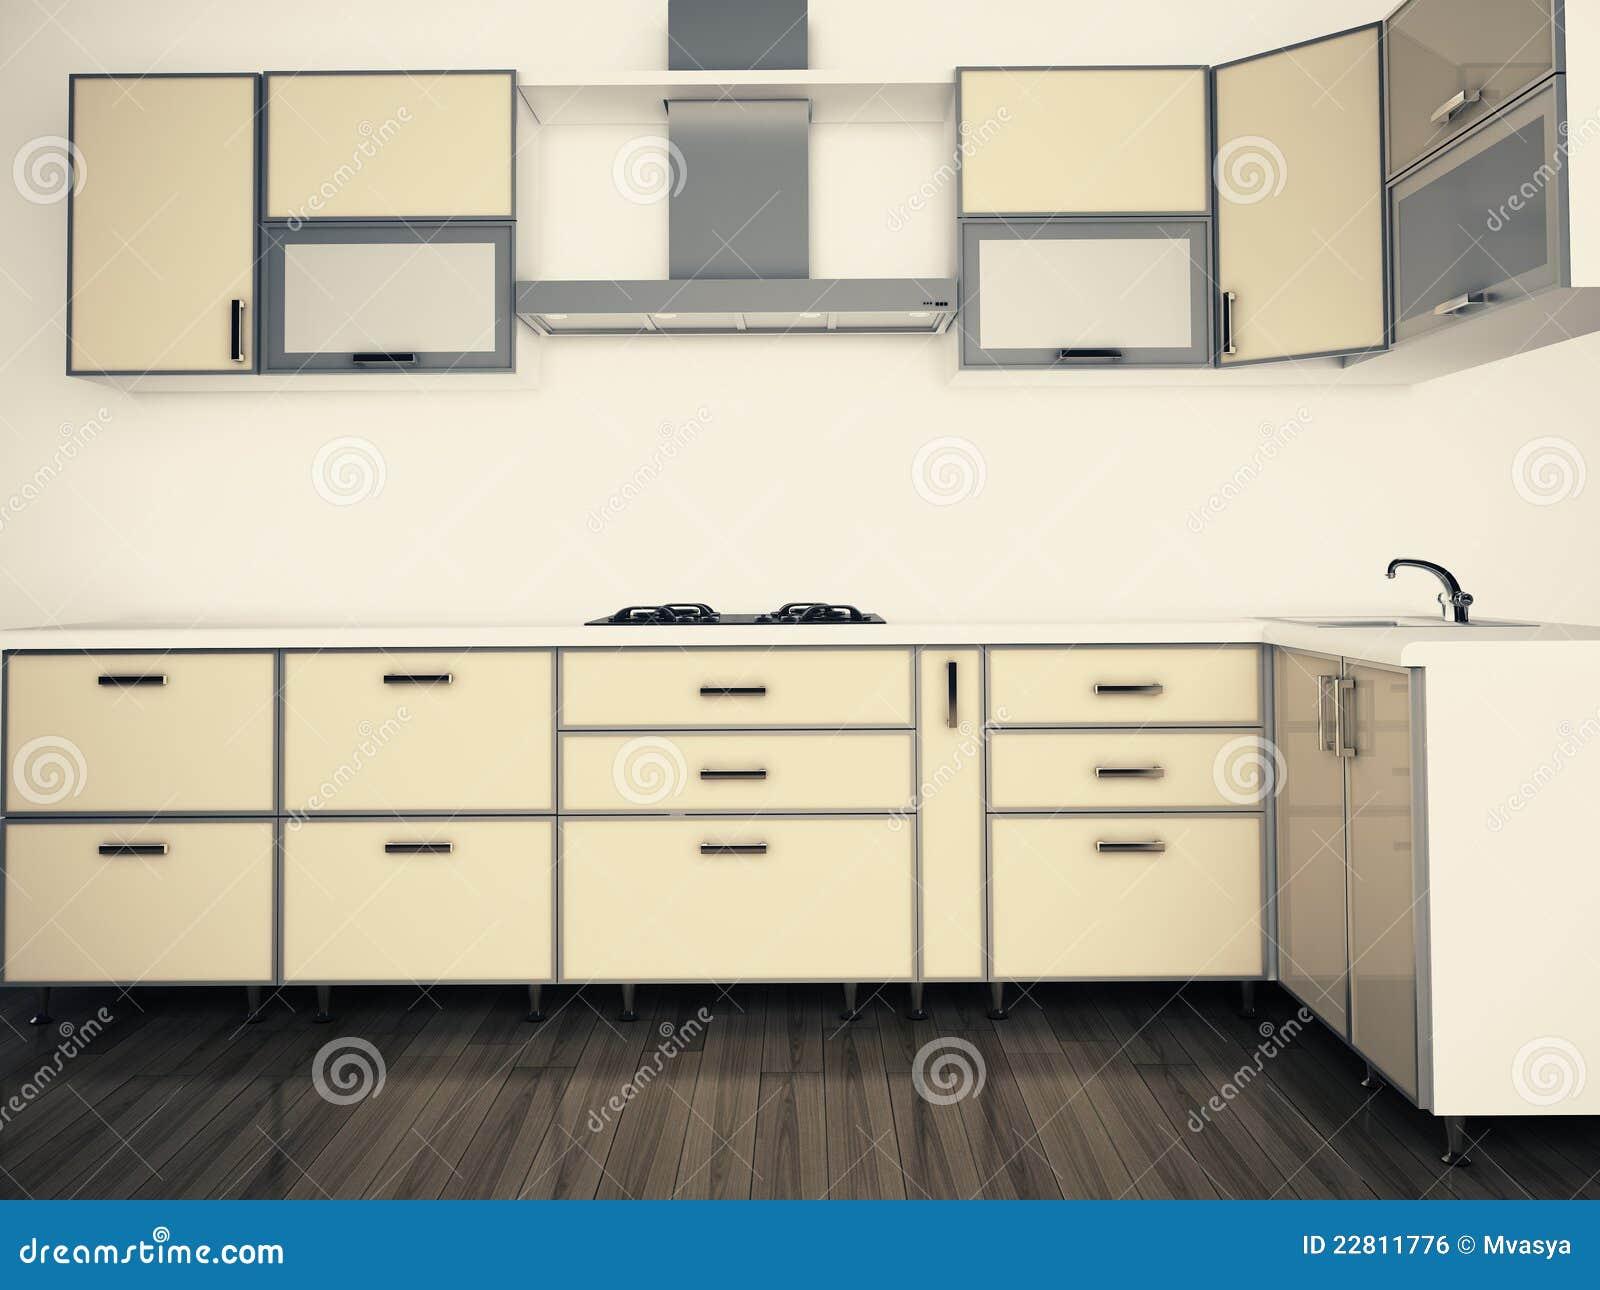 Modern Domestic Kitchen Stylish Interior Design Royalty Free